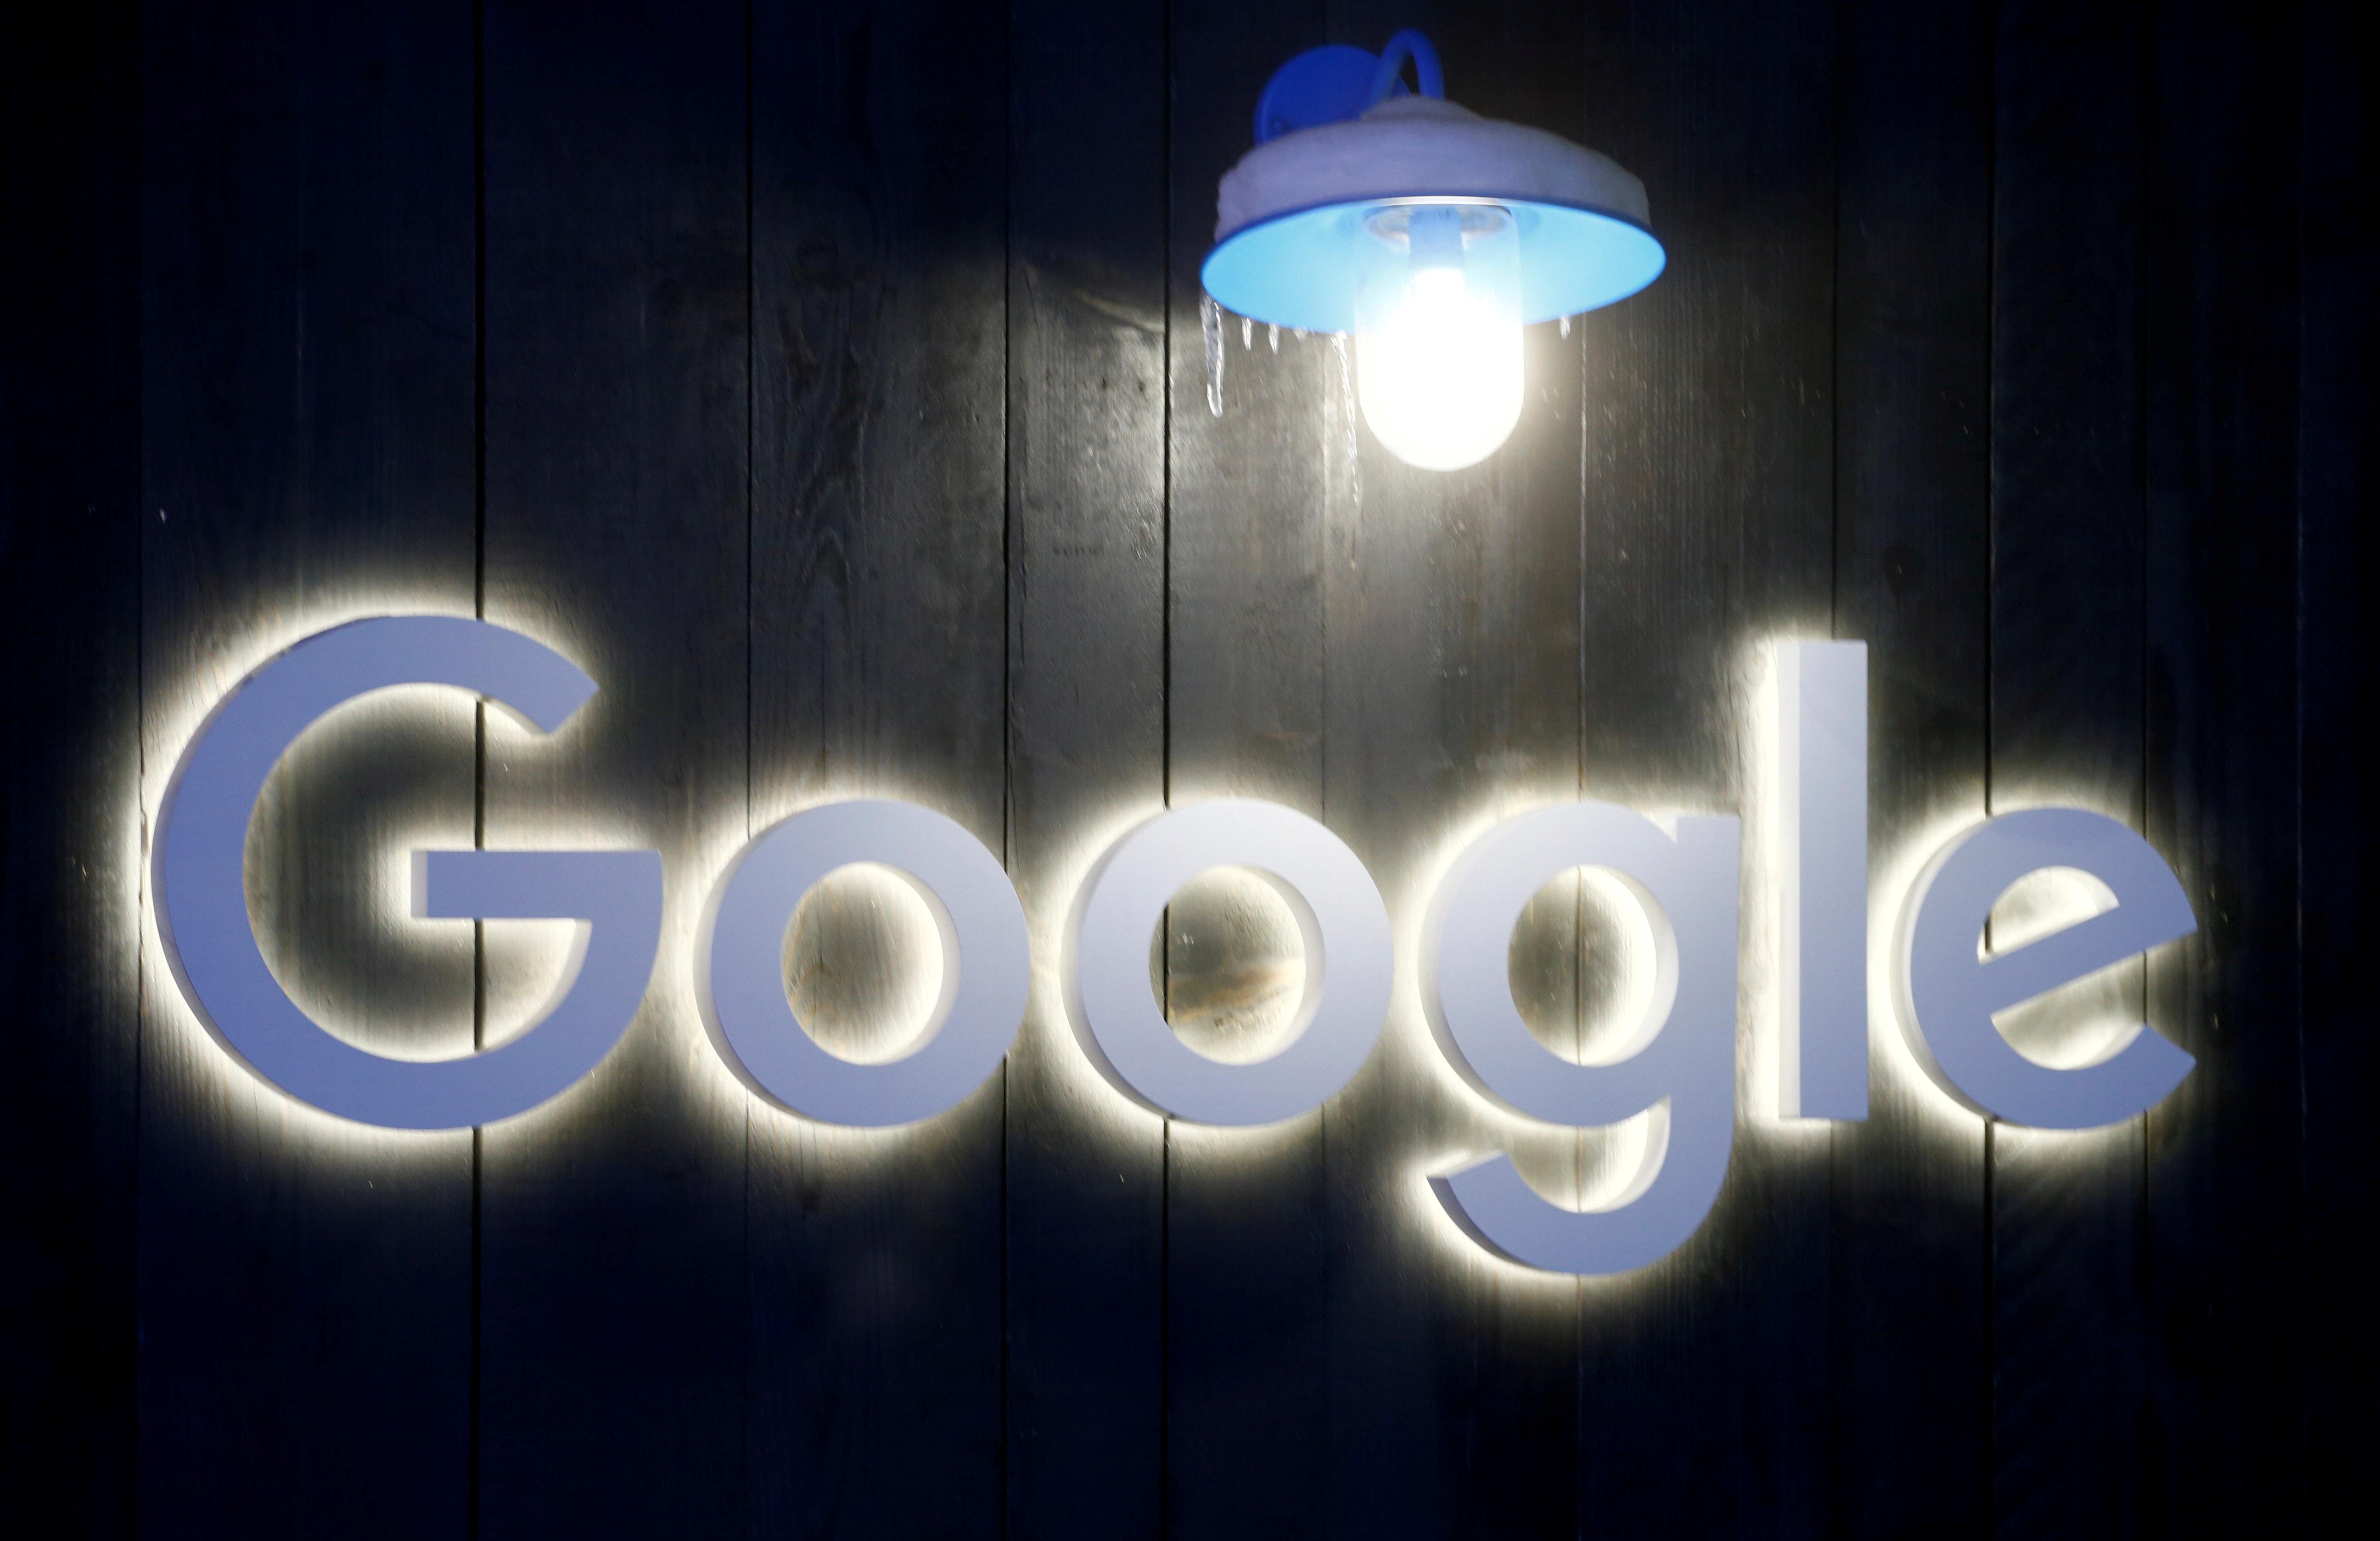 The logo of Google is seen in Davos, Switzerland Januar 20, 2020. REUTERS/Arnd Wiegmann/File Photo